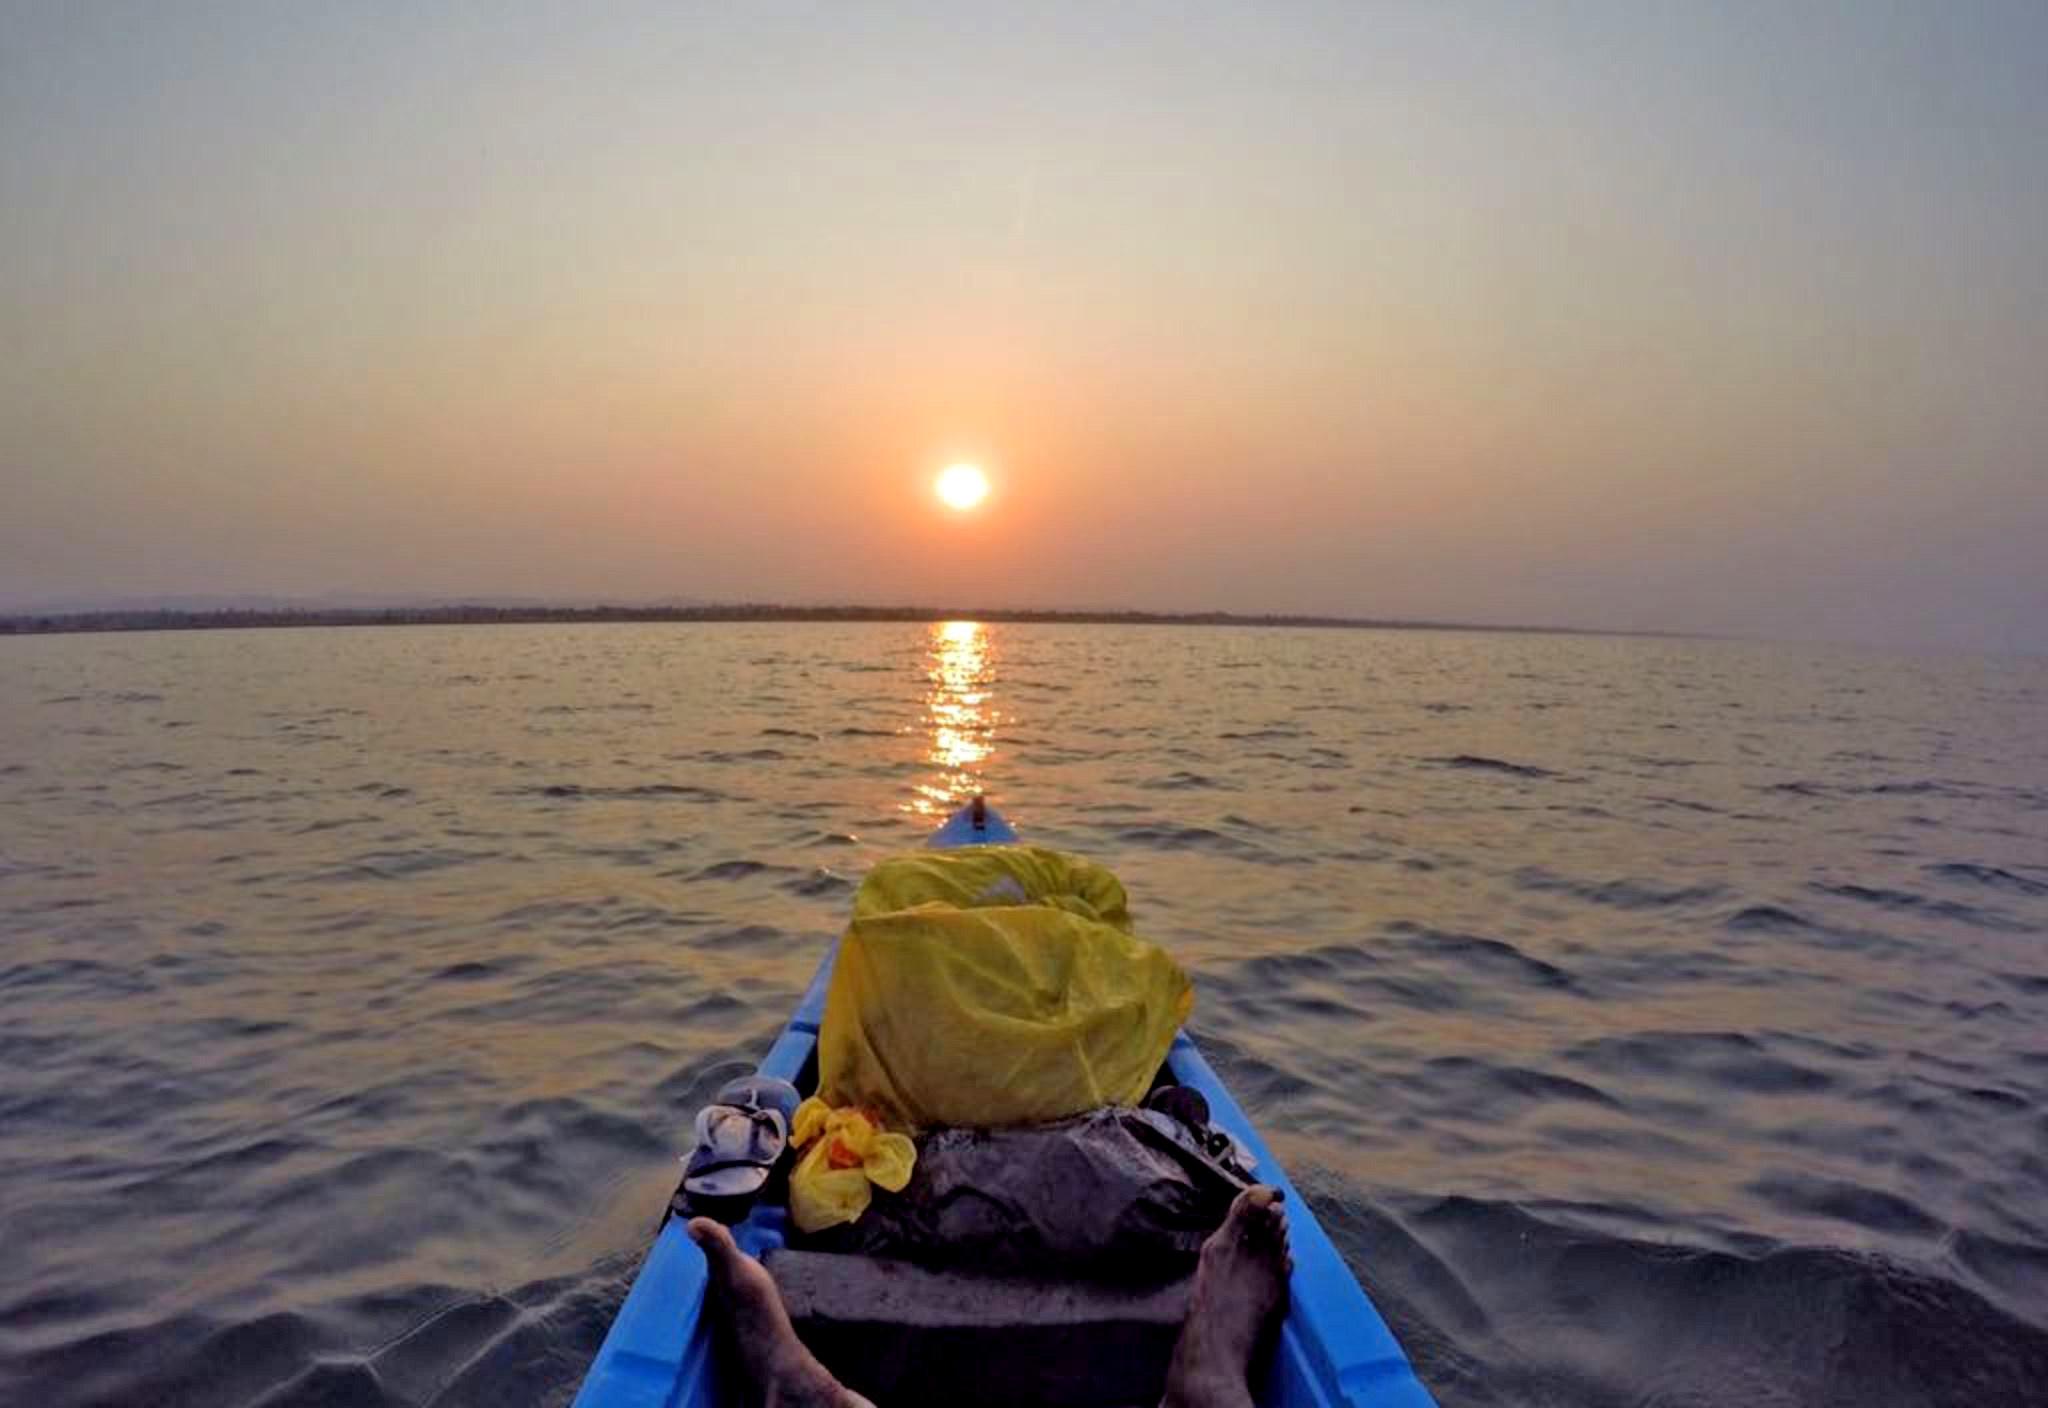 Kayaking the length of Lake Malawi, Africa by Mario Rigby